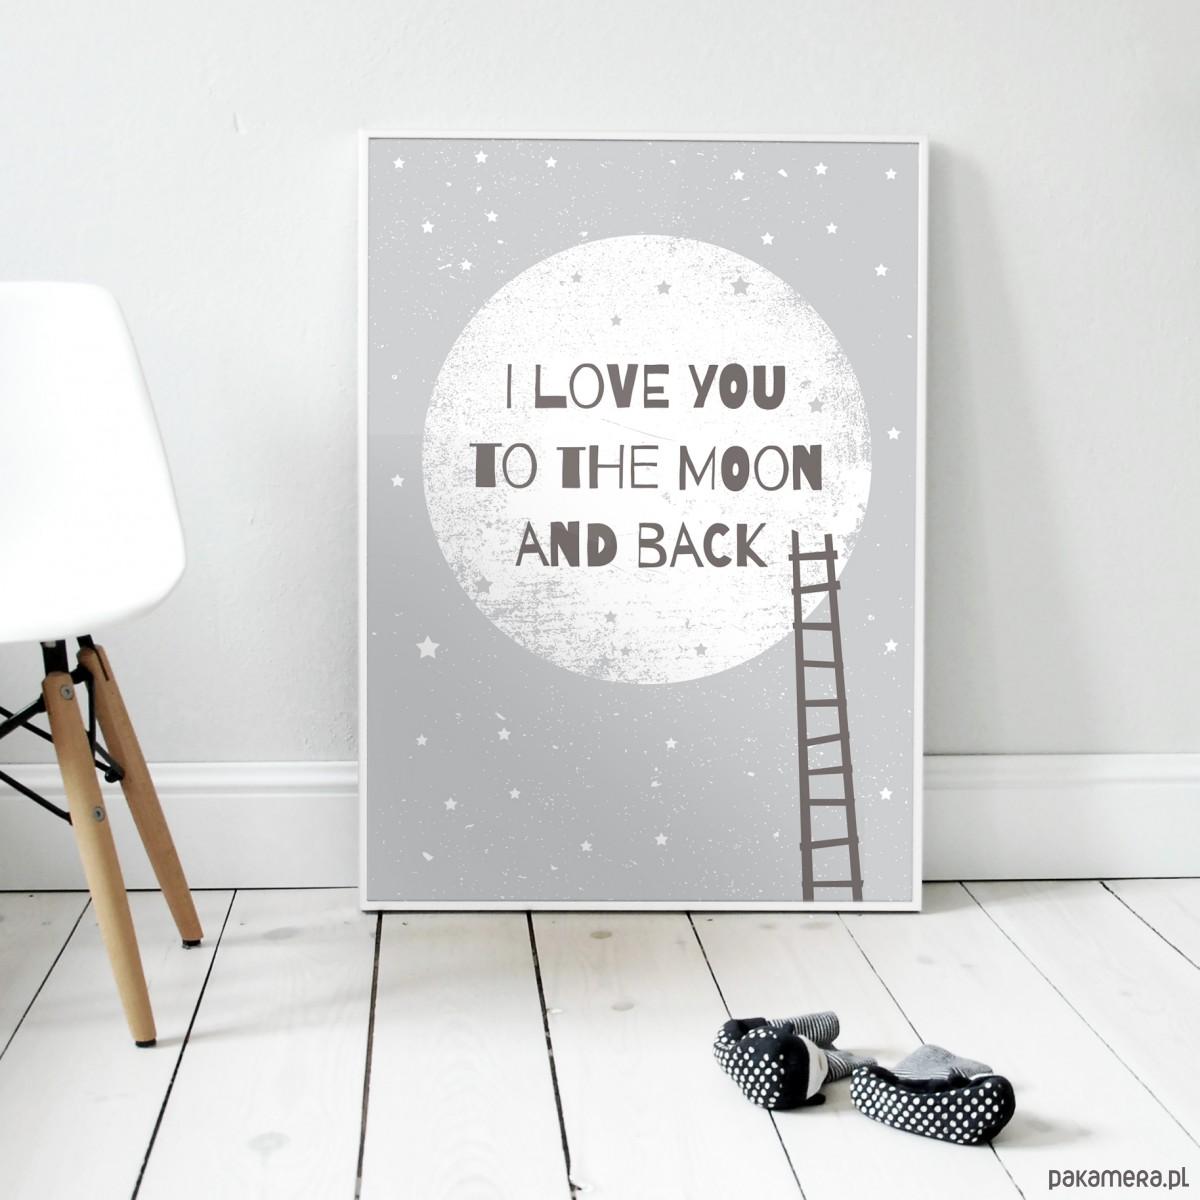 I Love You To The Moon And Back I Na Zamówienie Pakamerapl